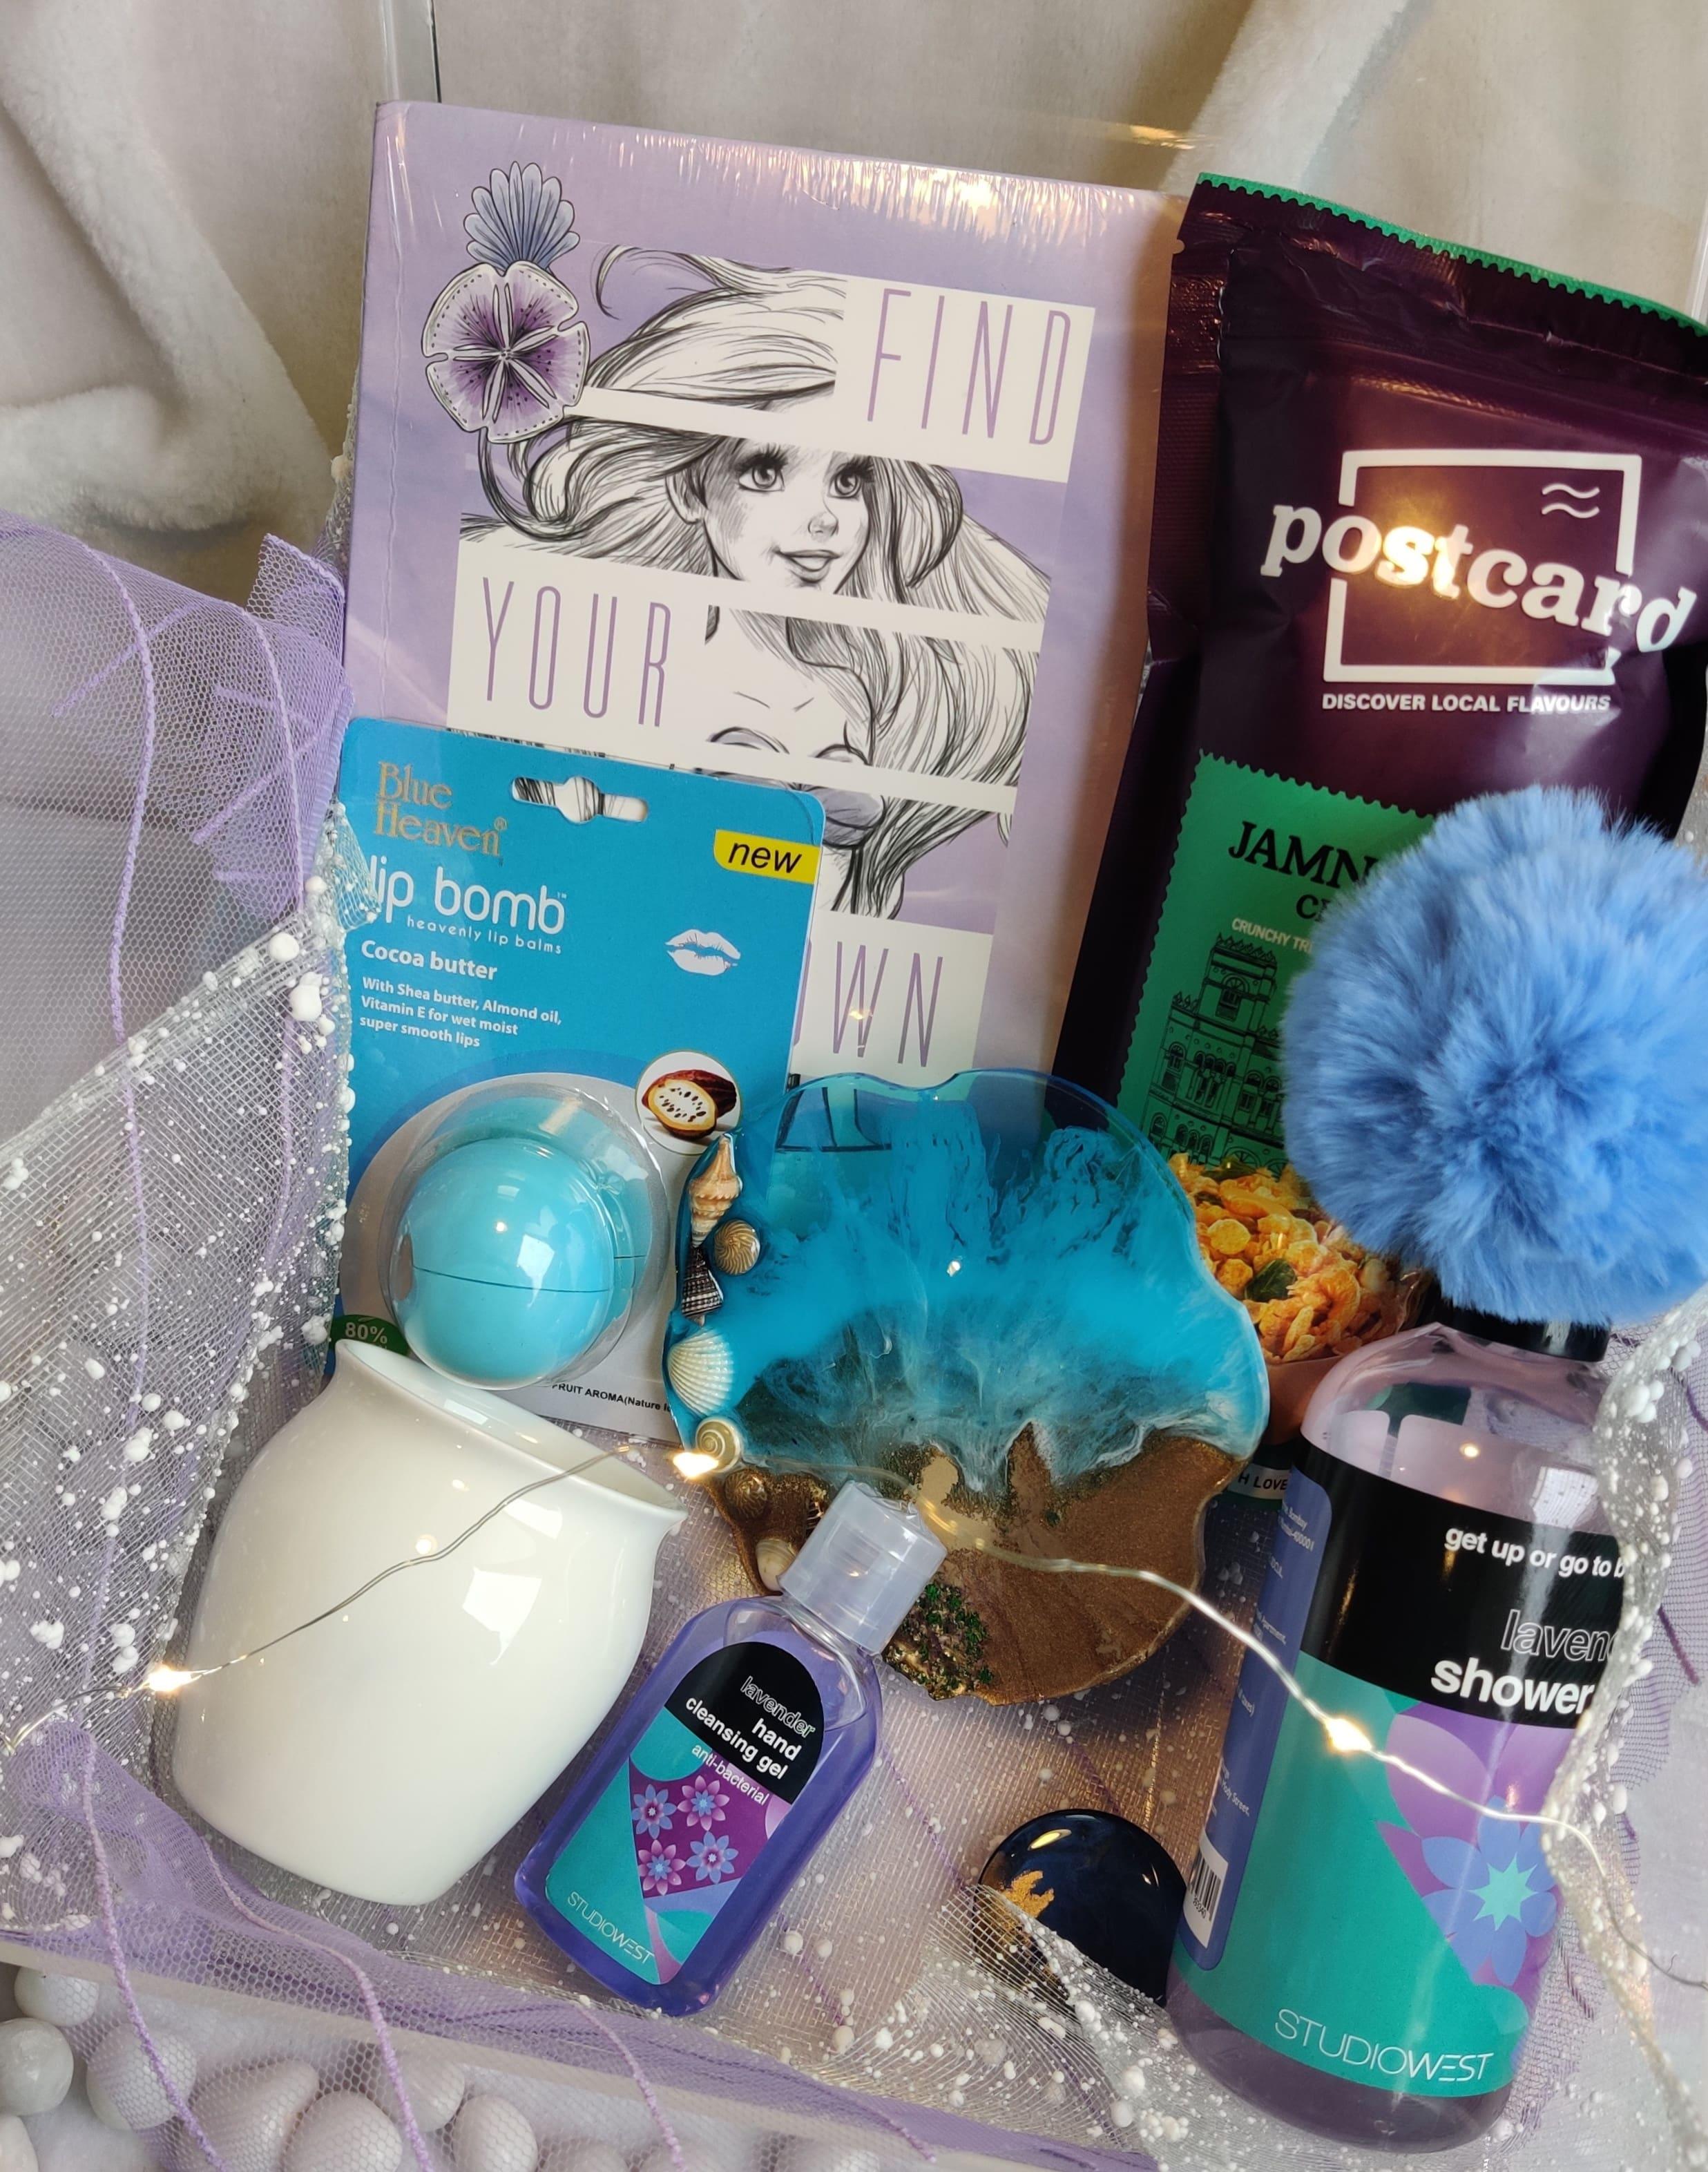 purple-princess-gift-online.jpg